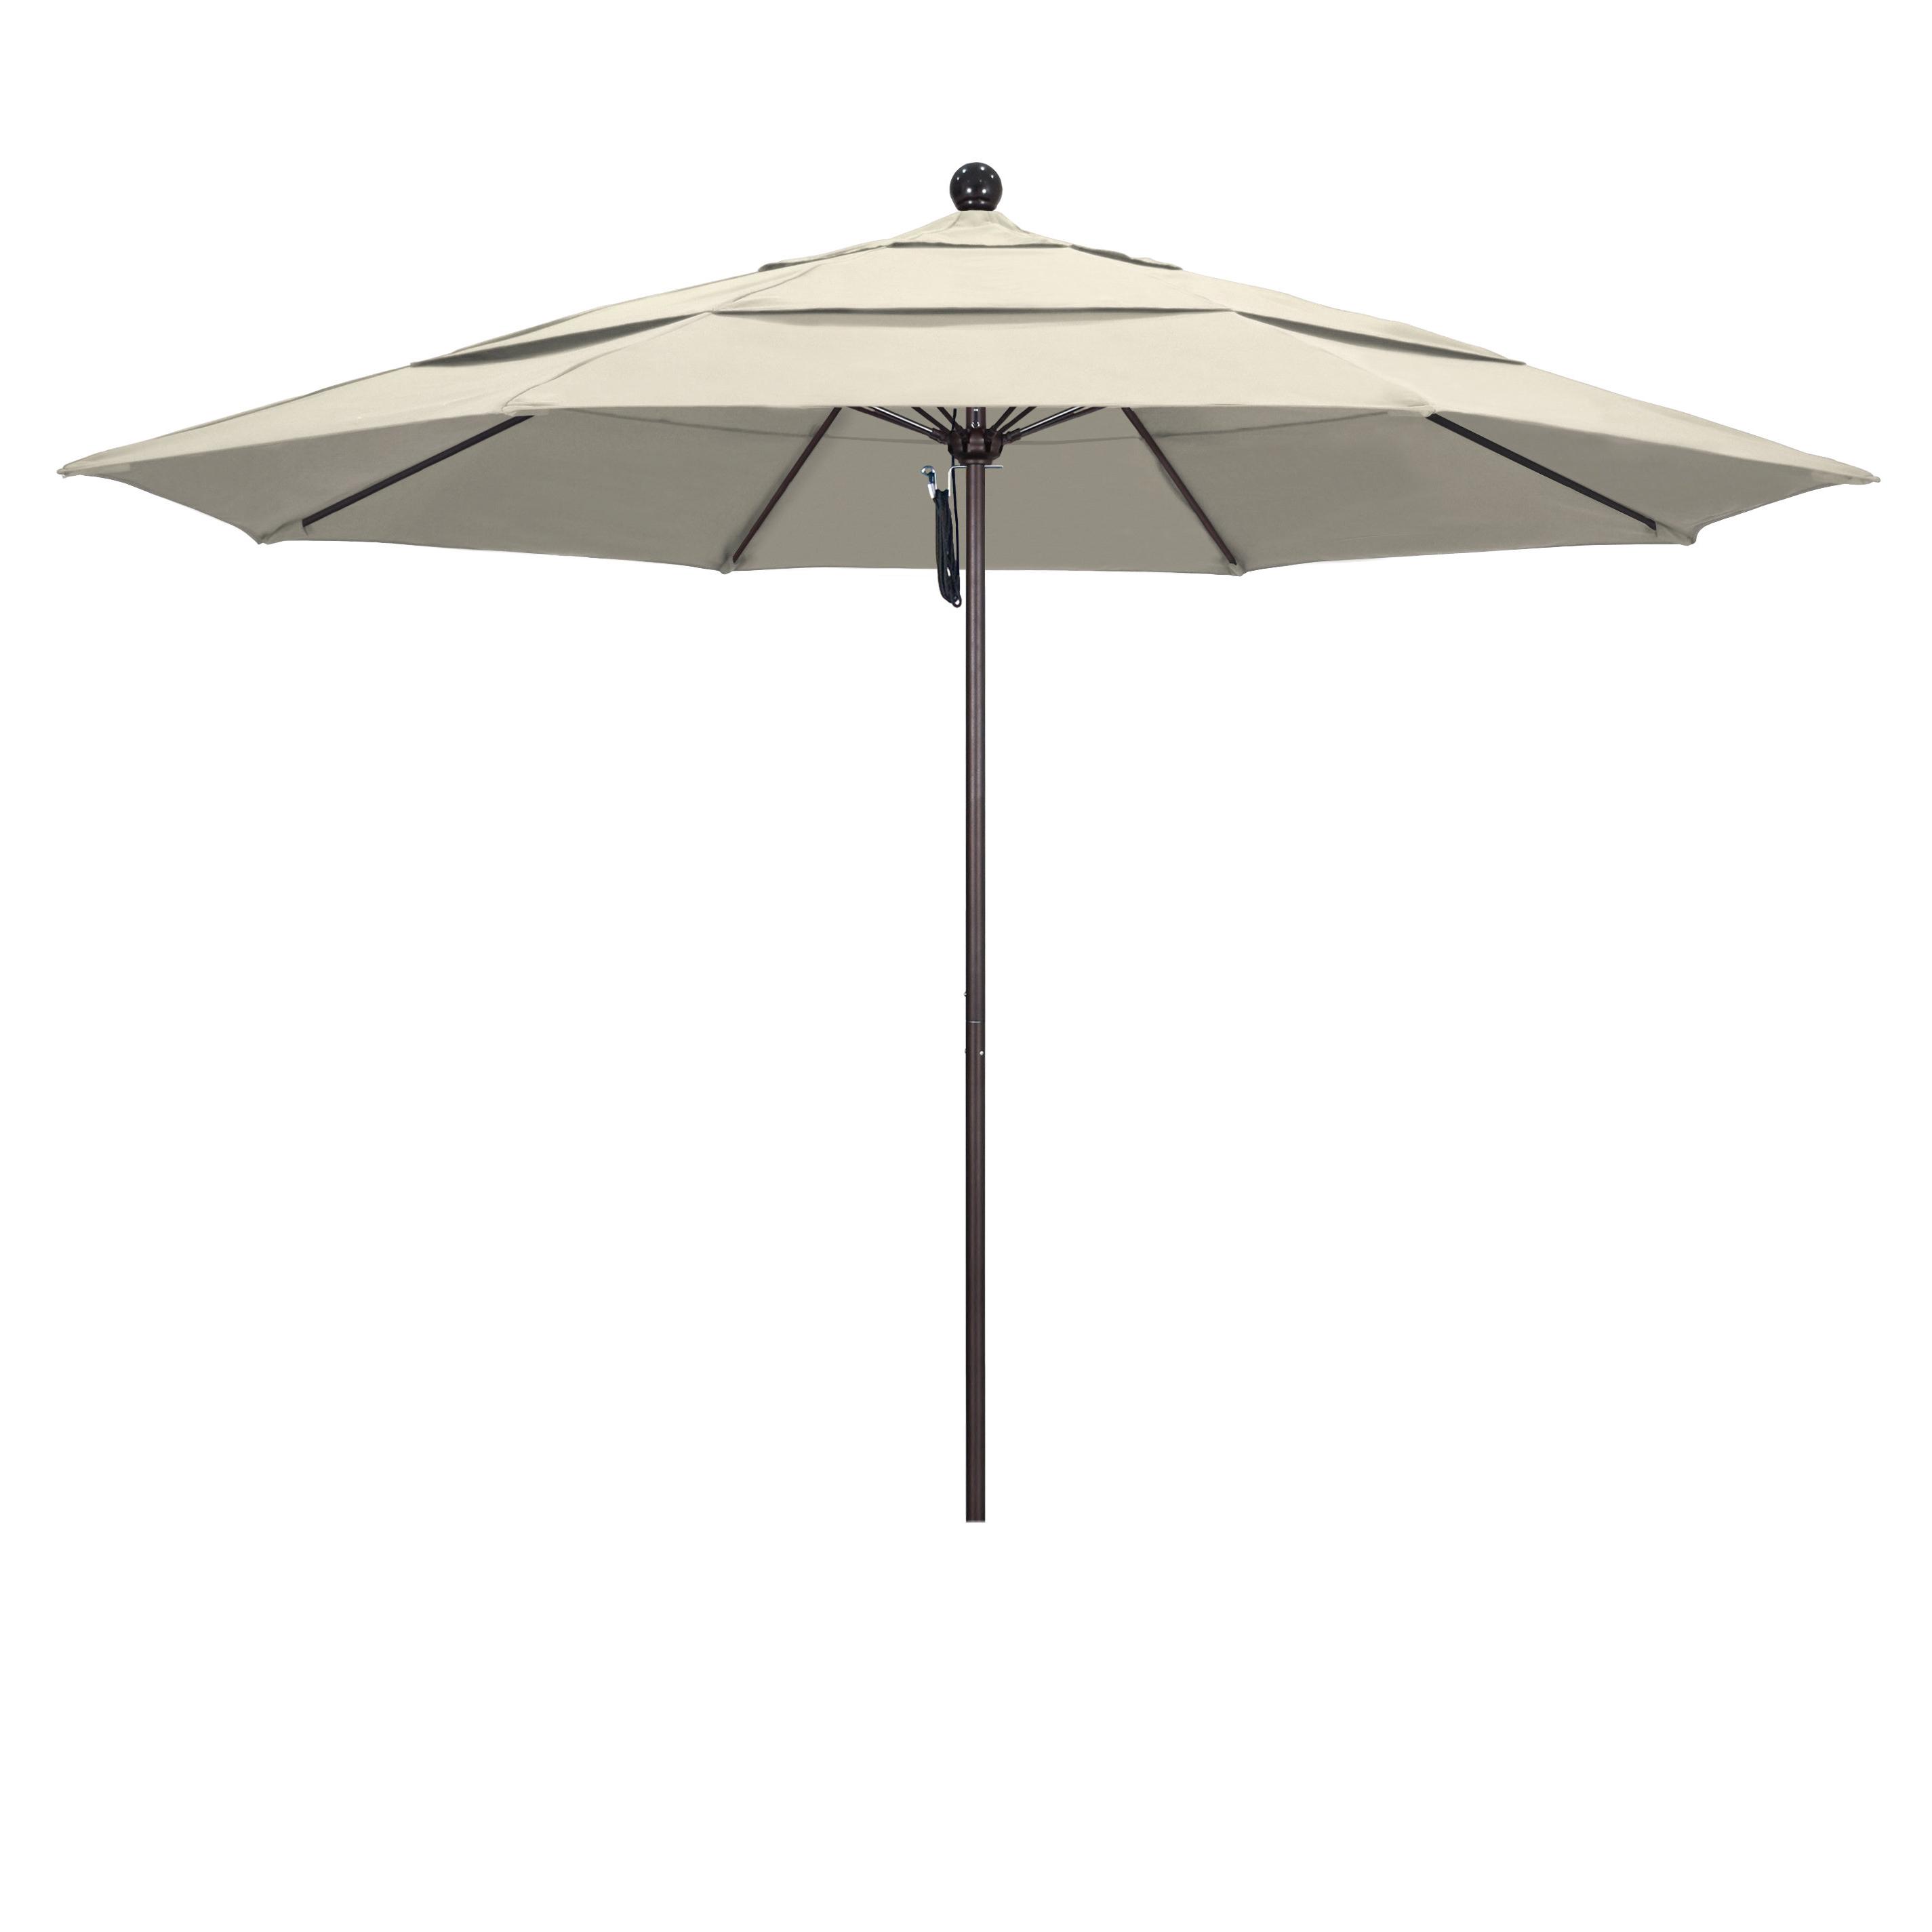 Duxbury 11' Market Umbrella Throughout Current Caravelle Market Sunbrella Umbrellas (View 12 of 20)